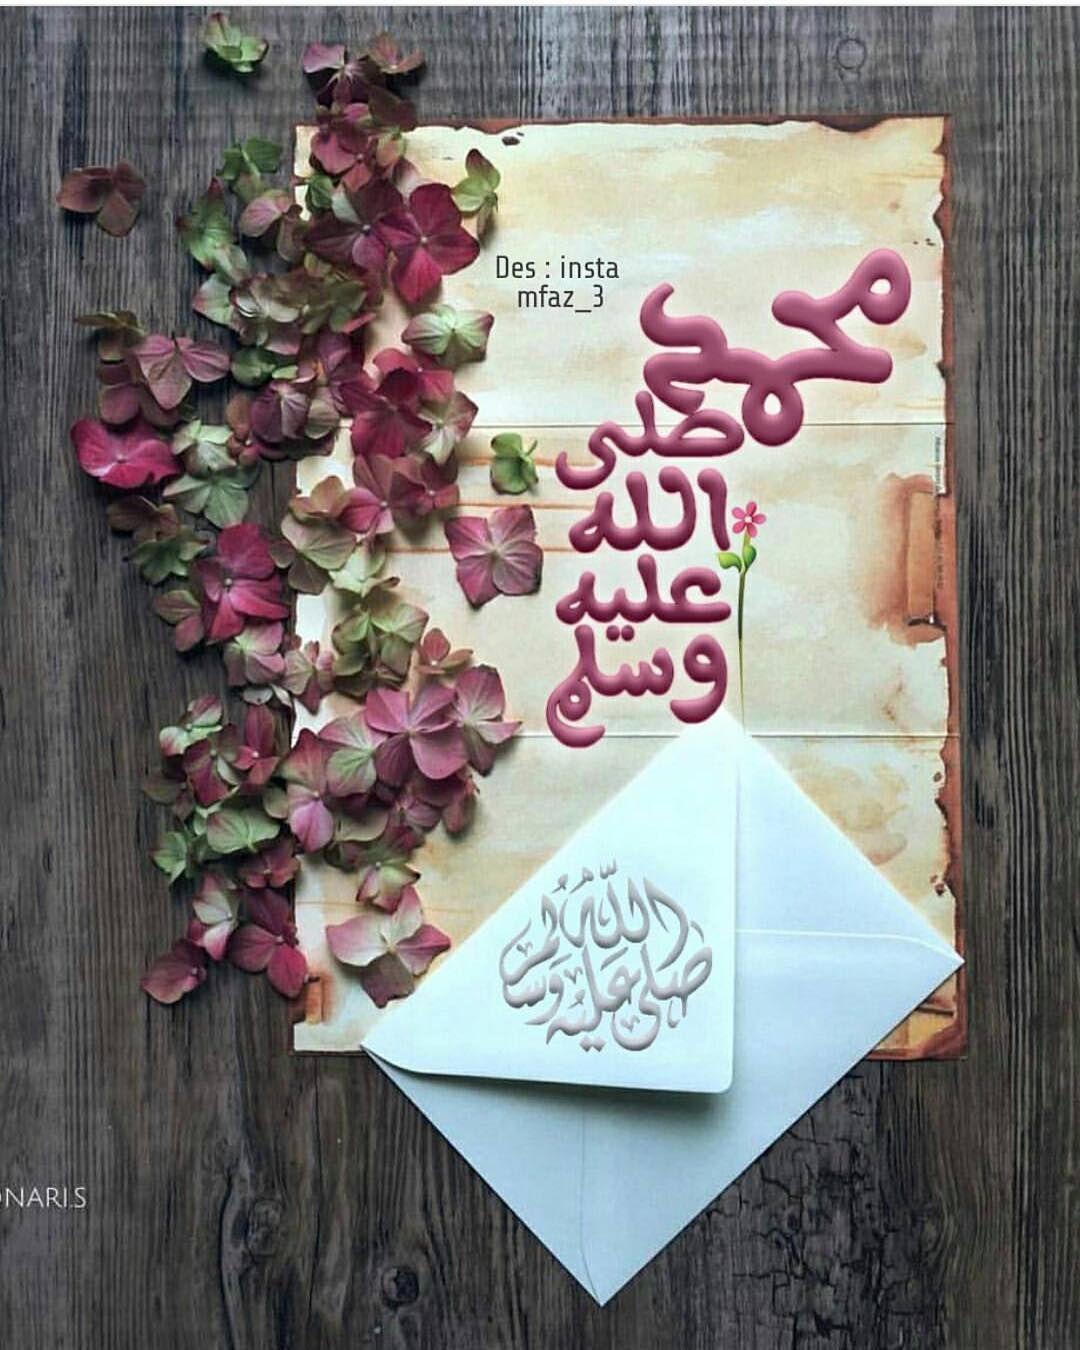 161 Likes 25 Comments Aℓi Ali Asm85 On Instagram إذا ما ضقت بالعيش الكئيب فبادر بالصلاة على الحبيب Instagram Posts Book Cover Instagram